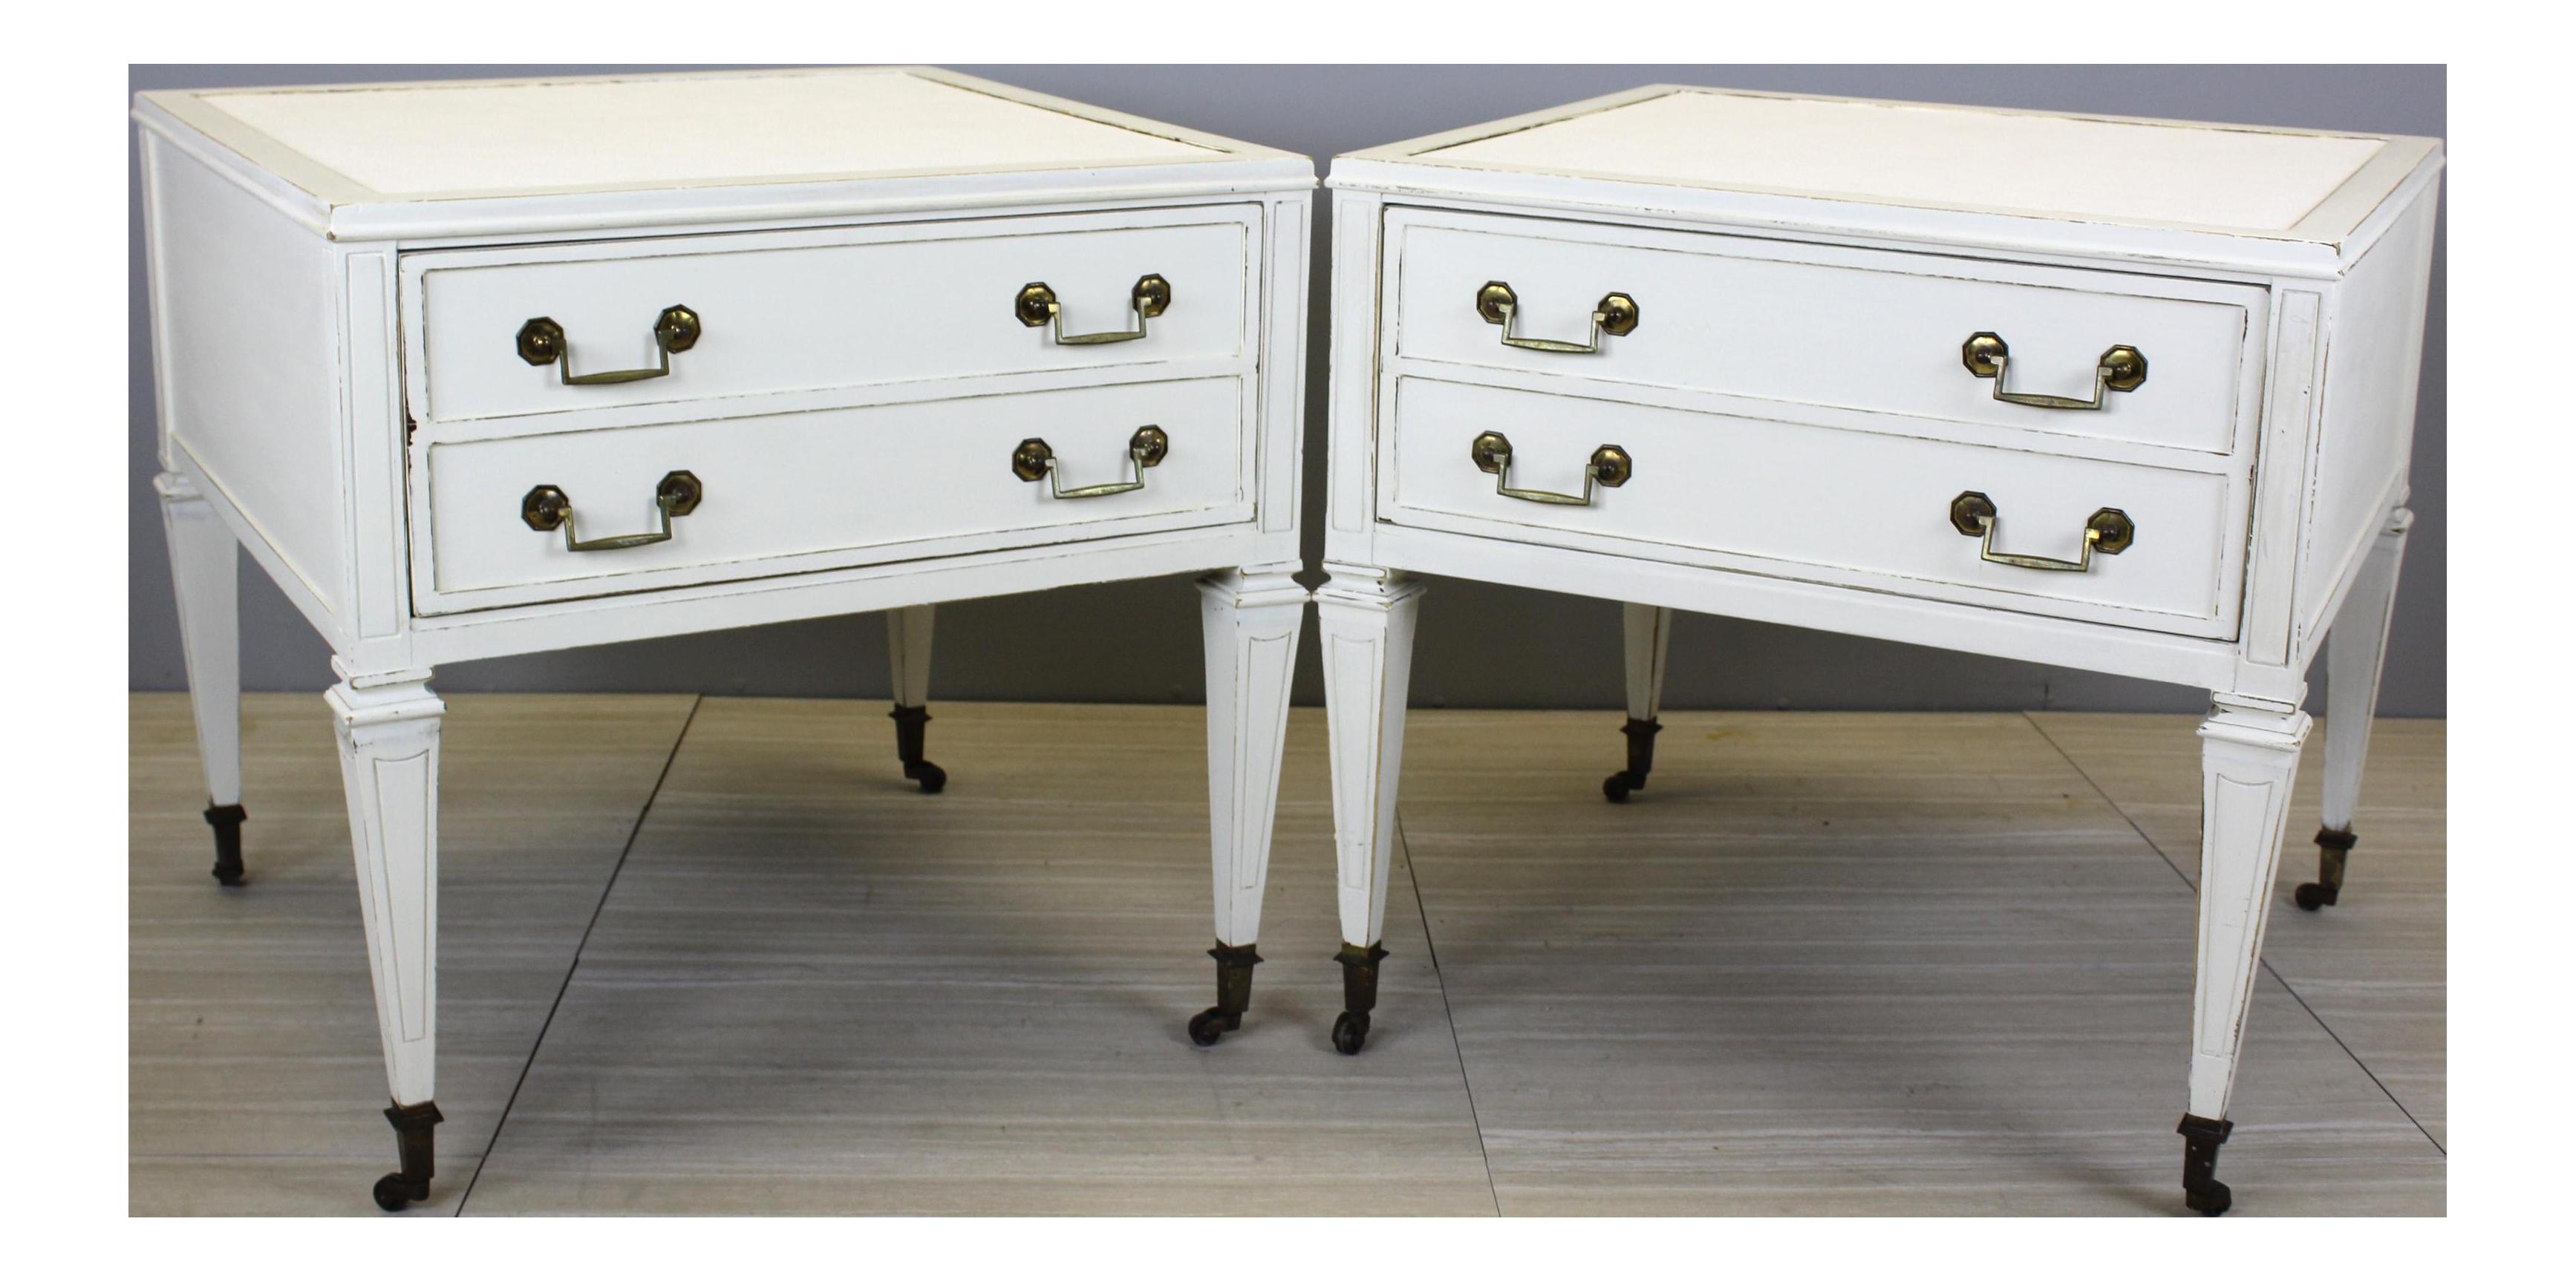 mid century modern nightstands pair of nightstands vintage white nightstands